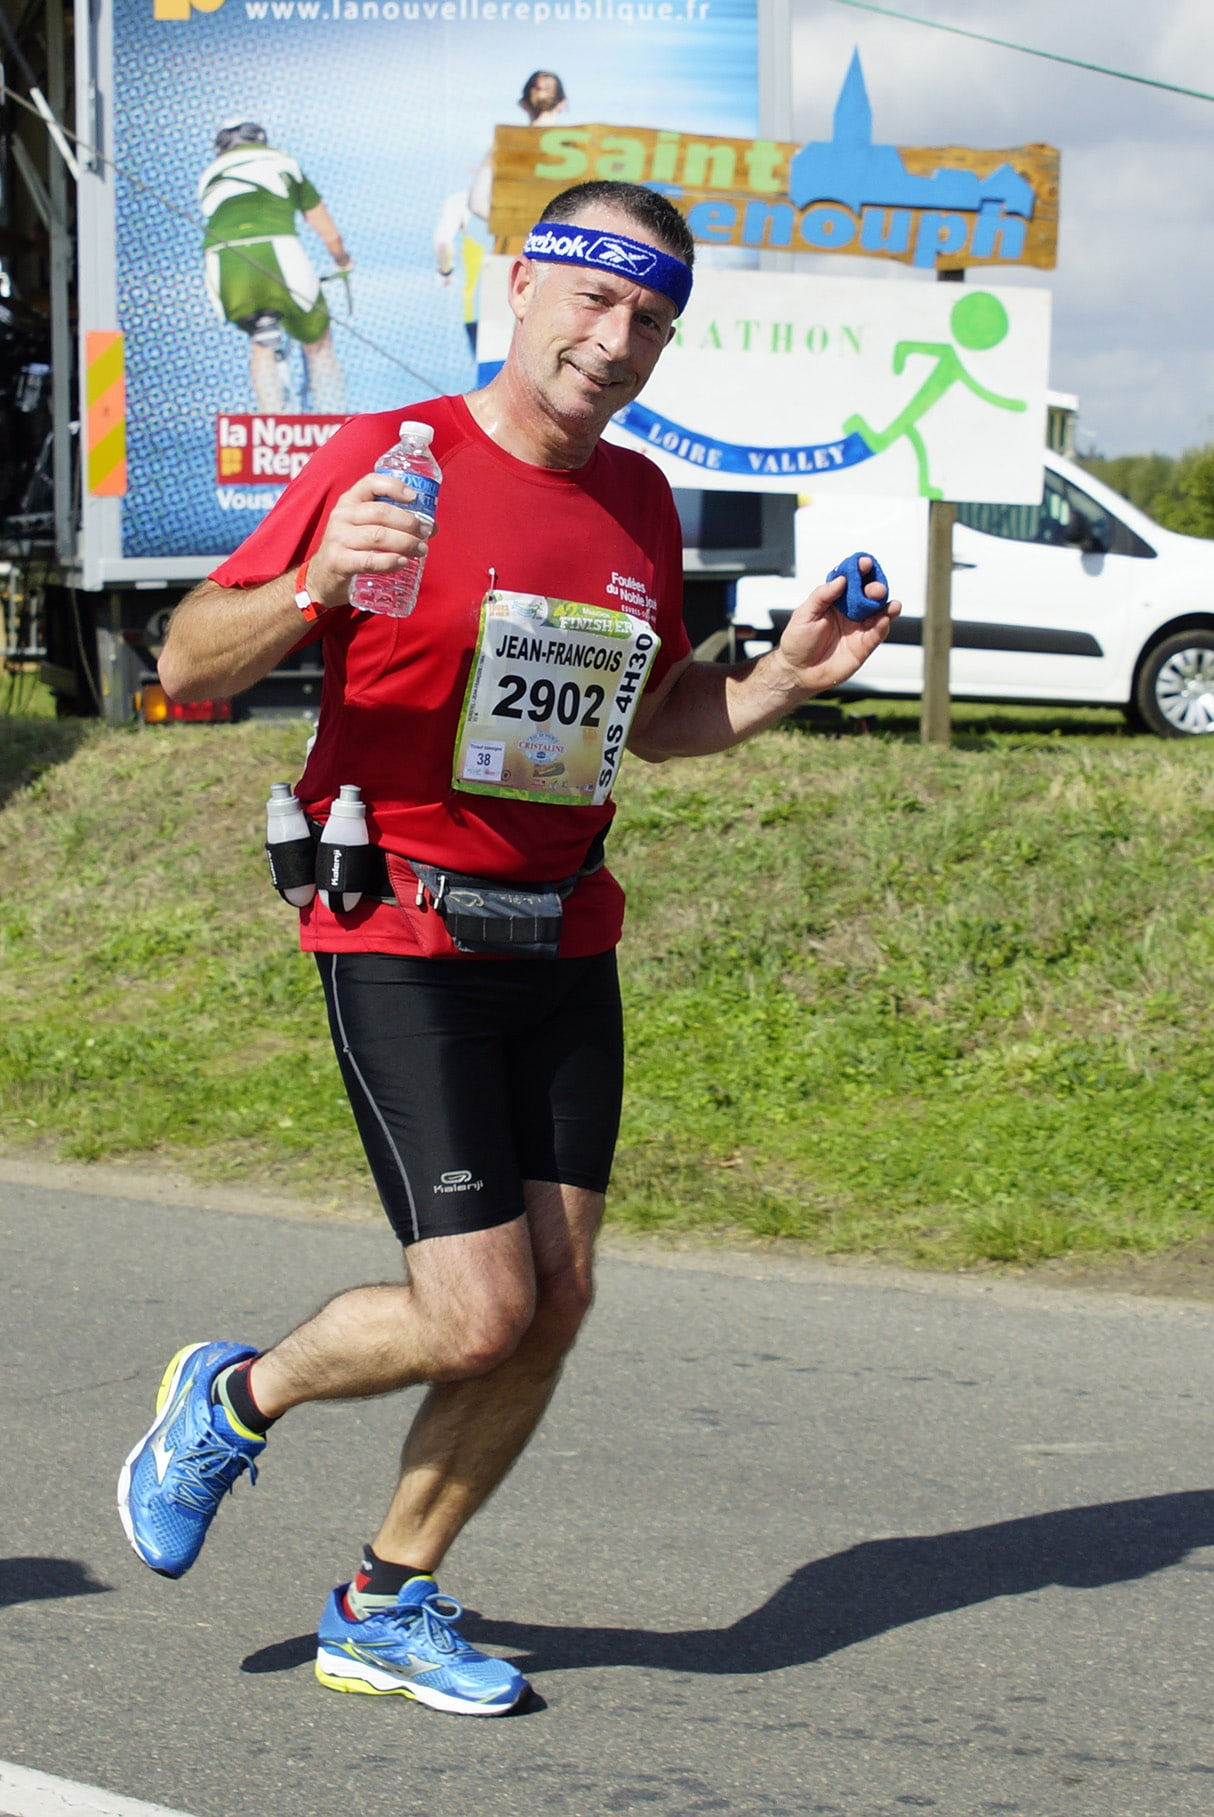 marathon-Jean-Francois-03